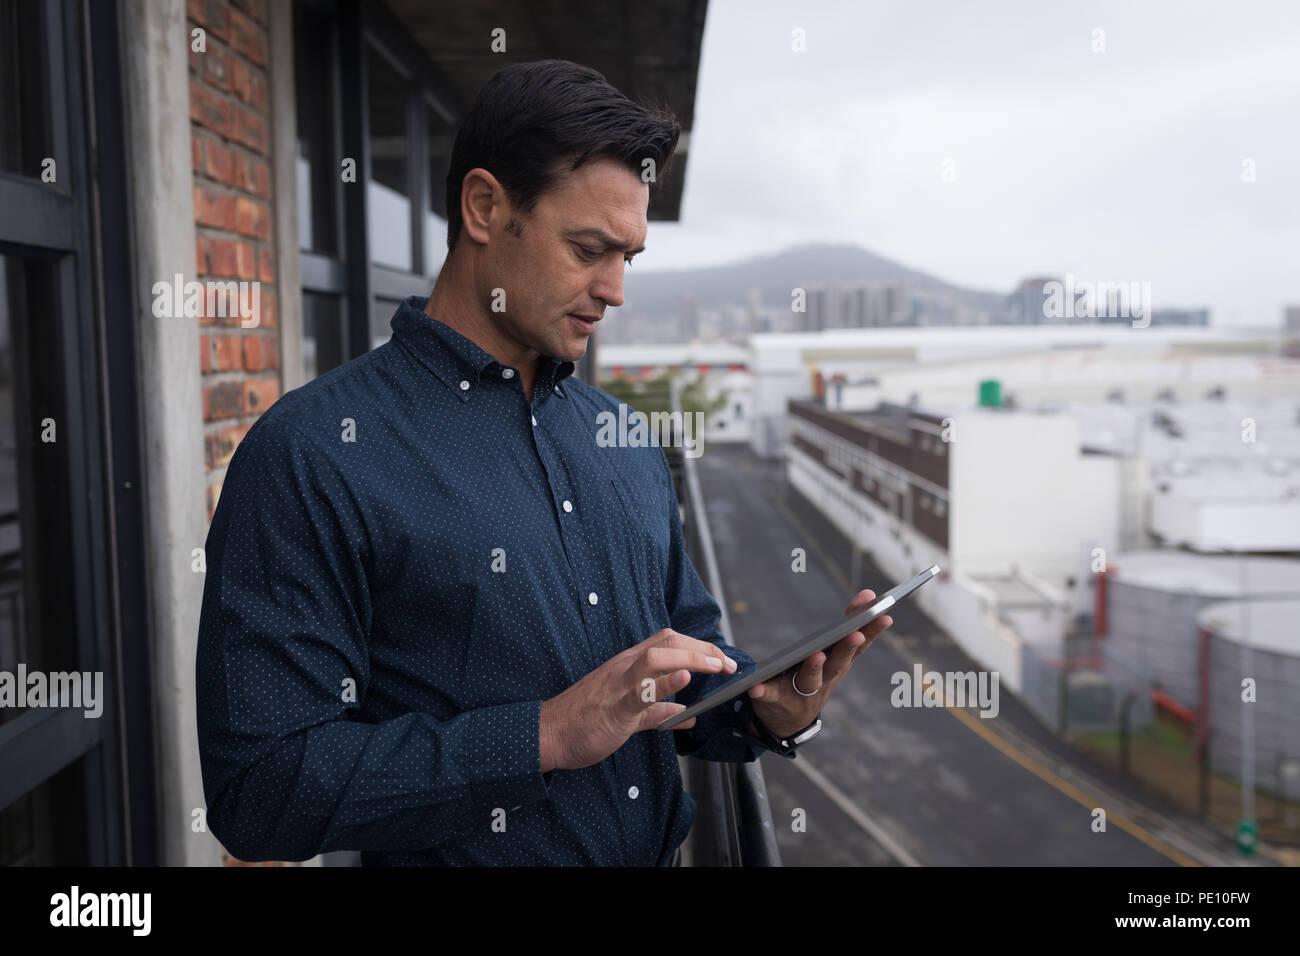 Businessman using digital tablet in balcon Photo Stock